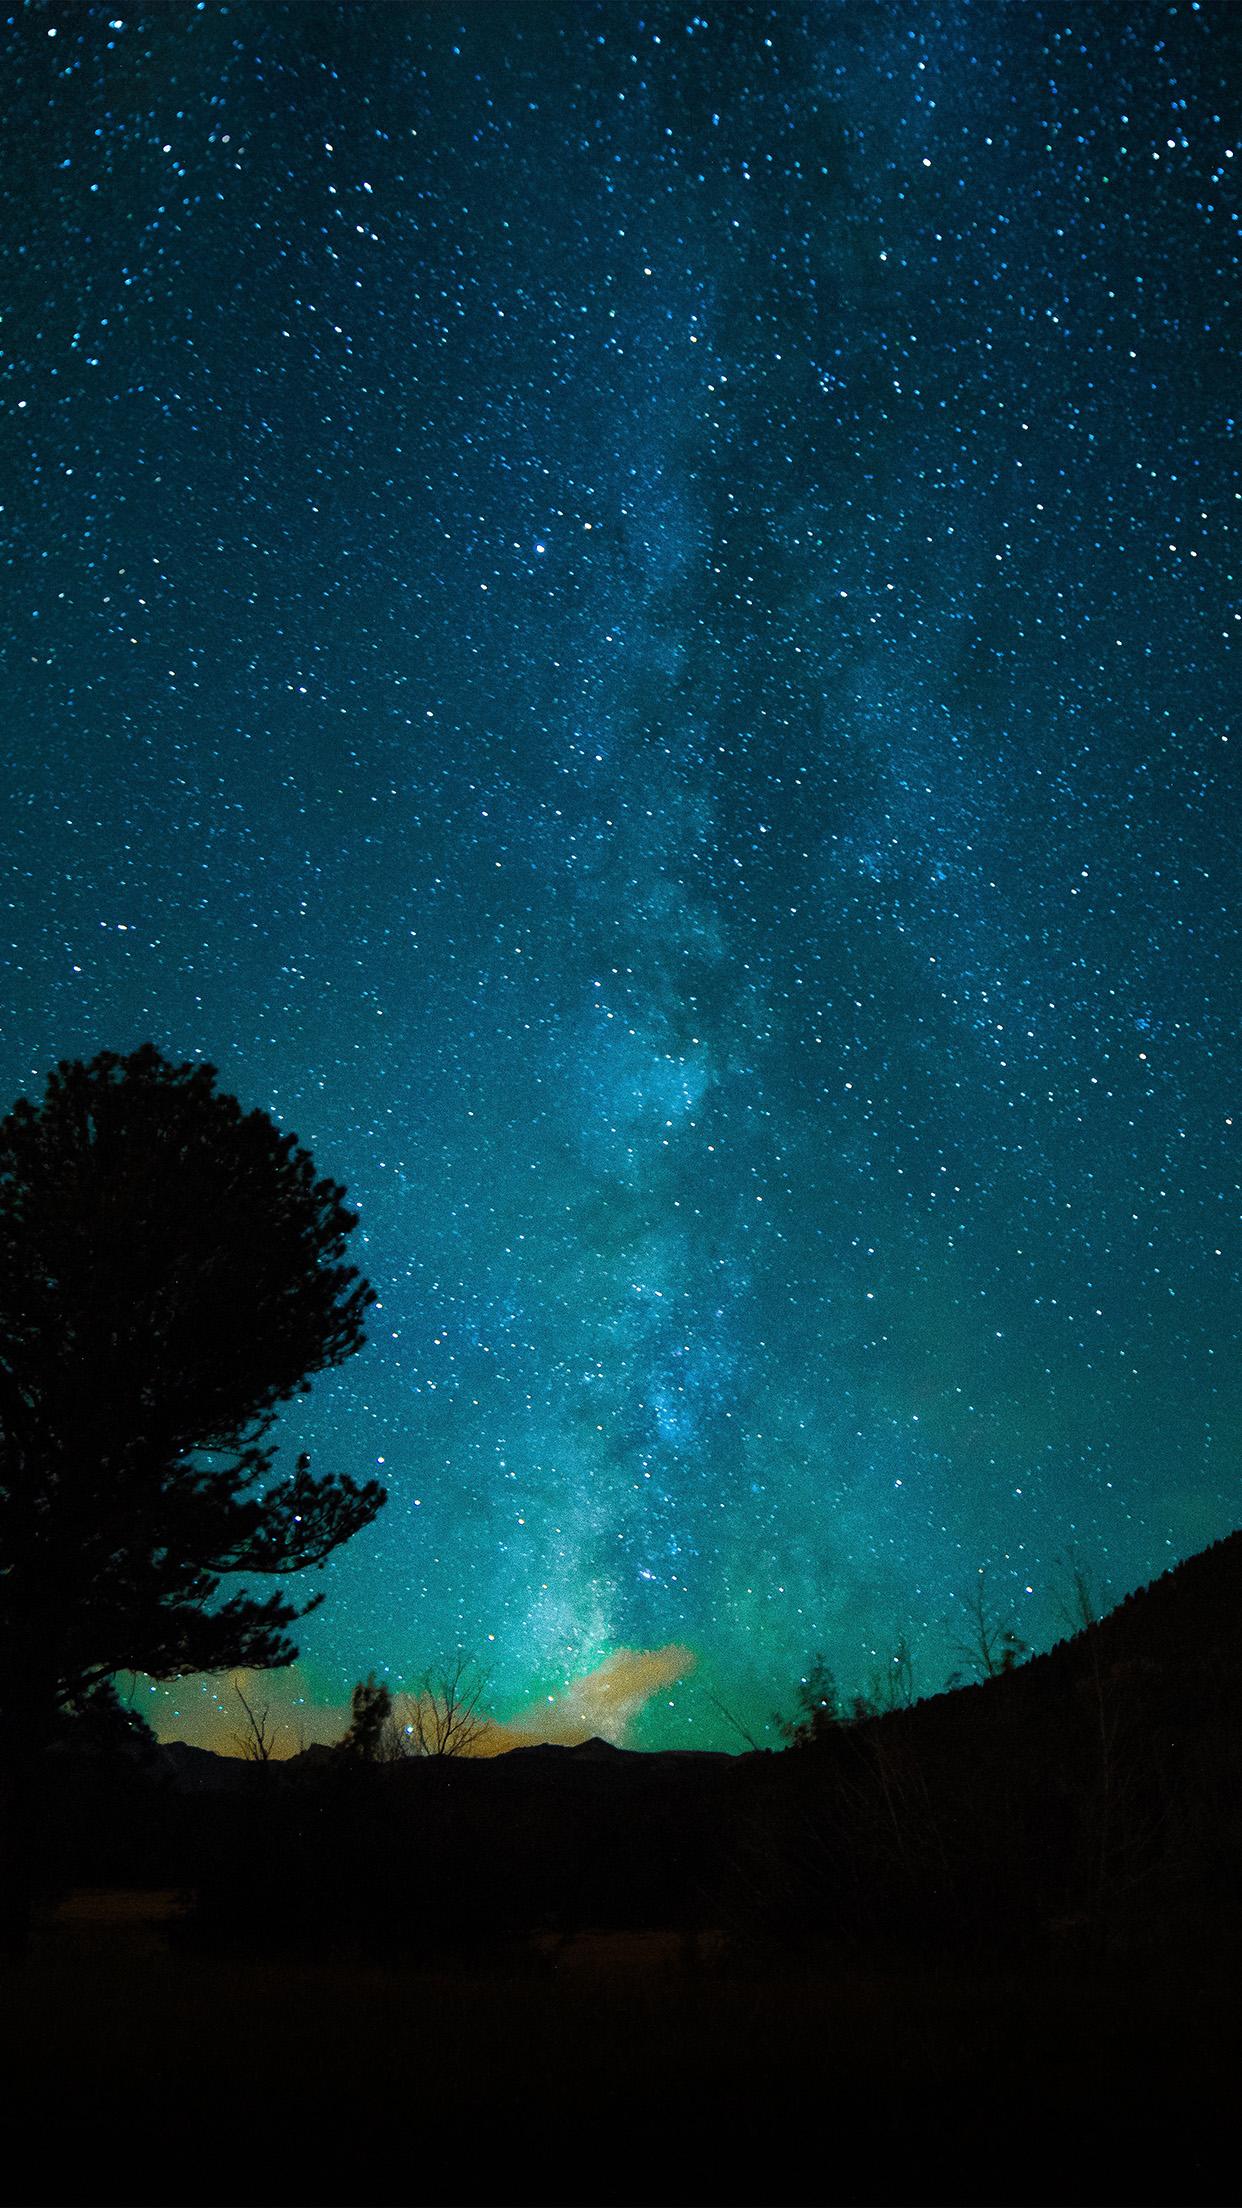 Iphone7papers Com Iphone7 Wallpaper My57 Aurora Night Sky Star